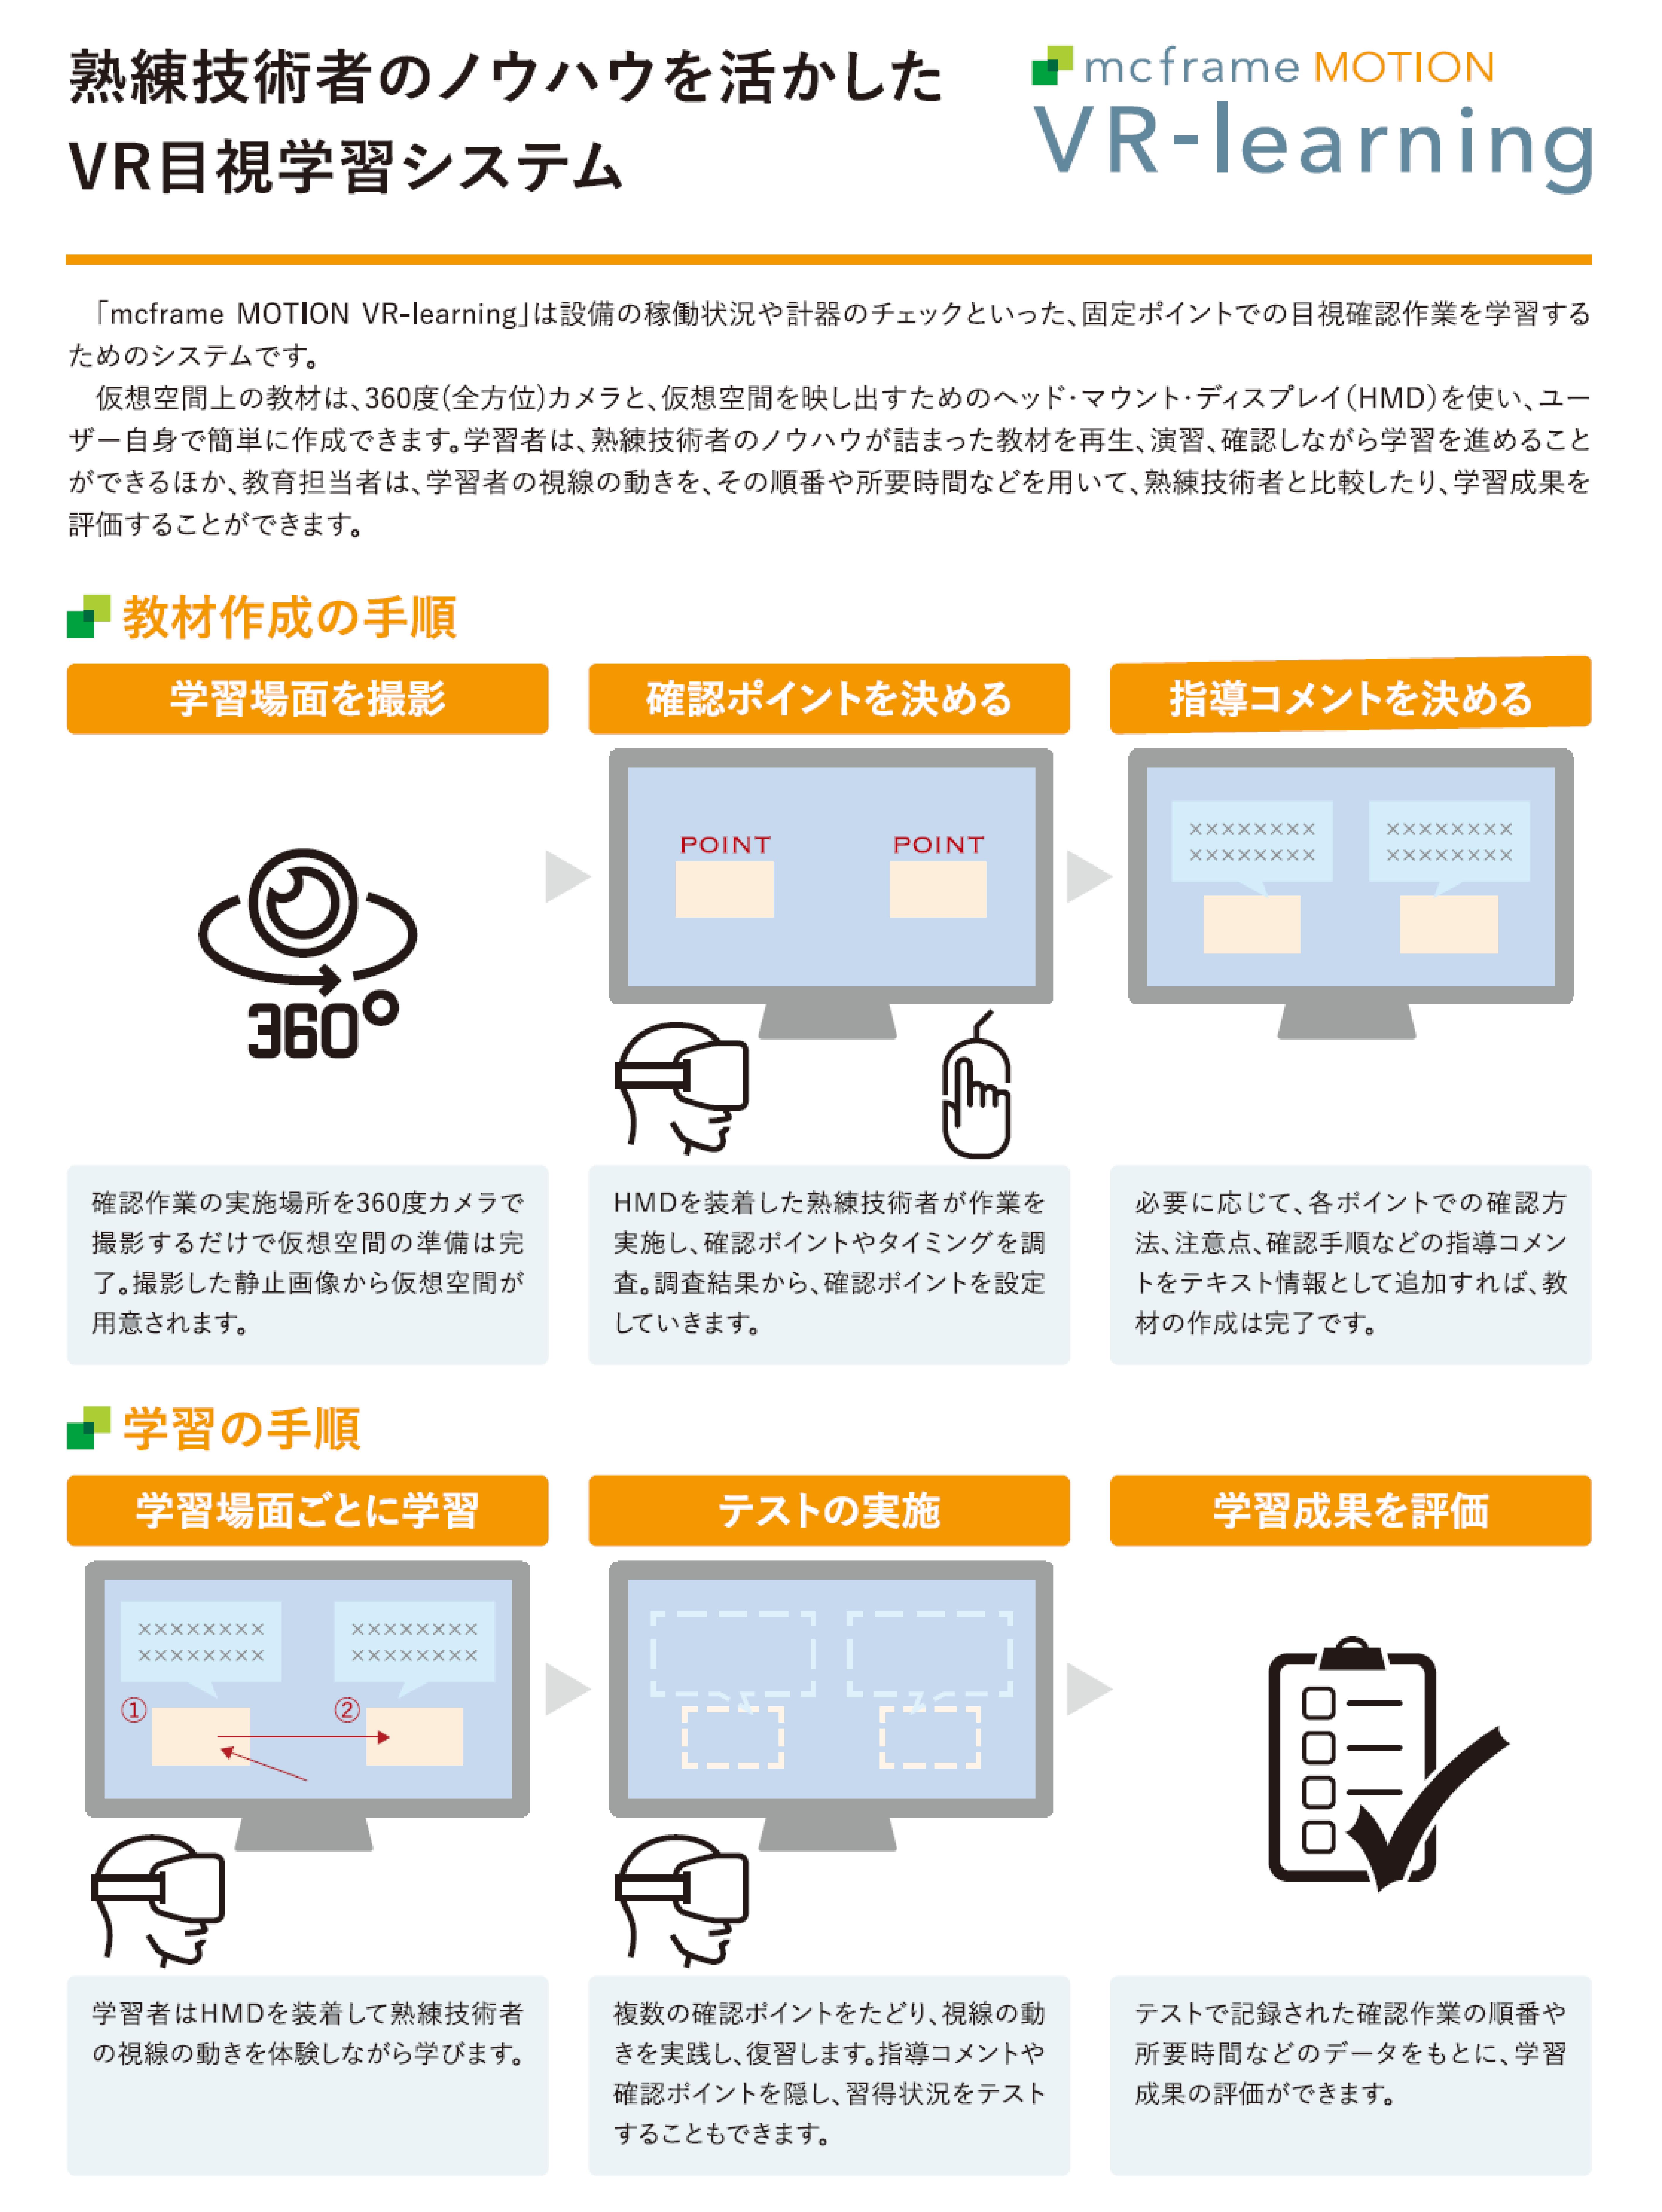 「mcframe MOTION VR-learning 」 製品紹介資料